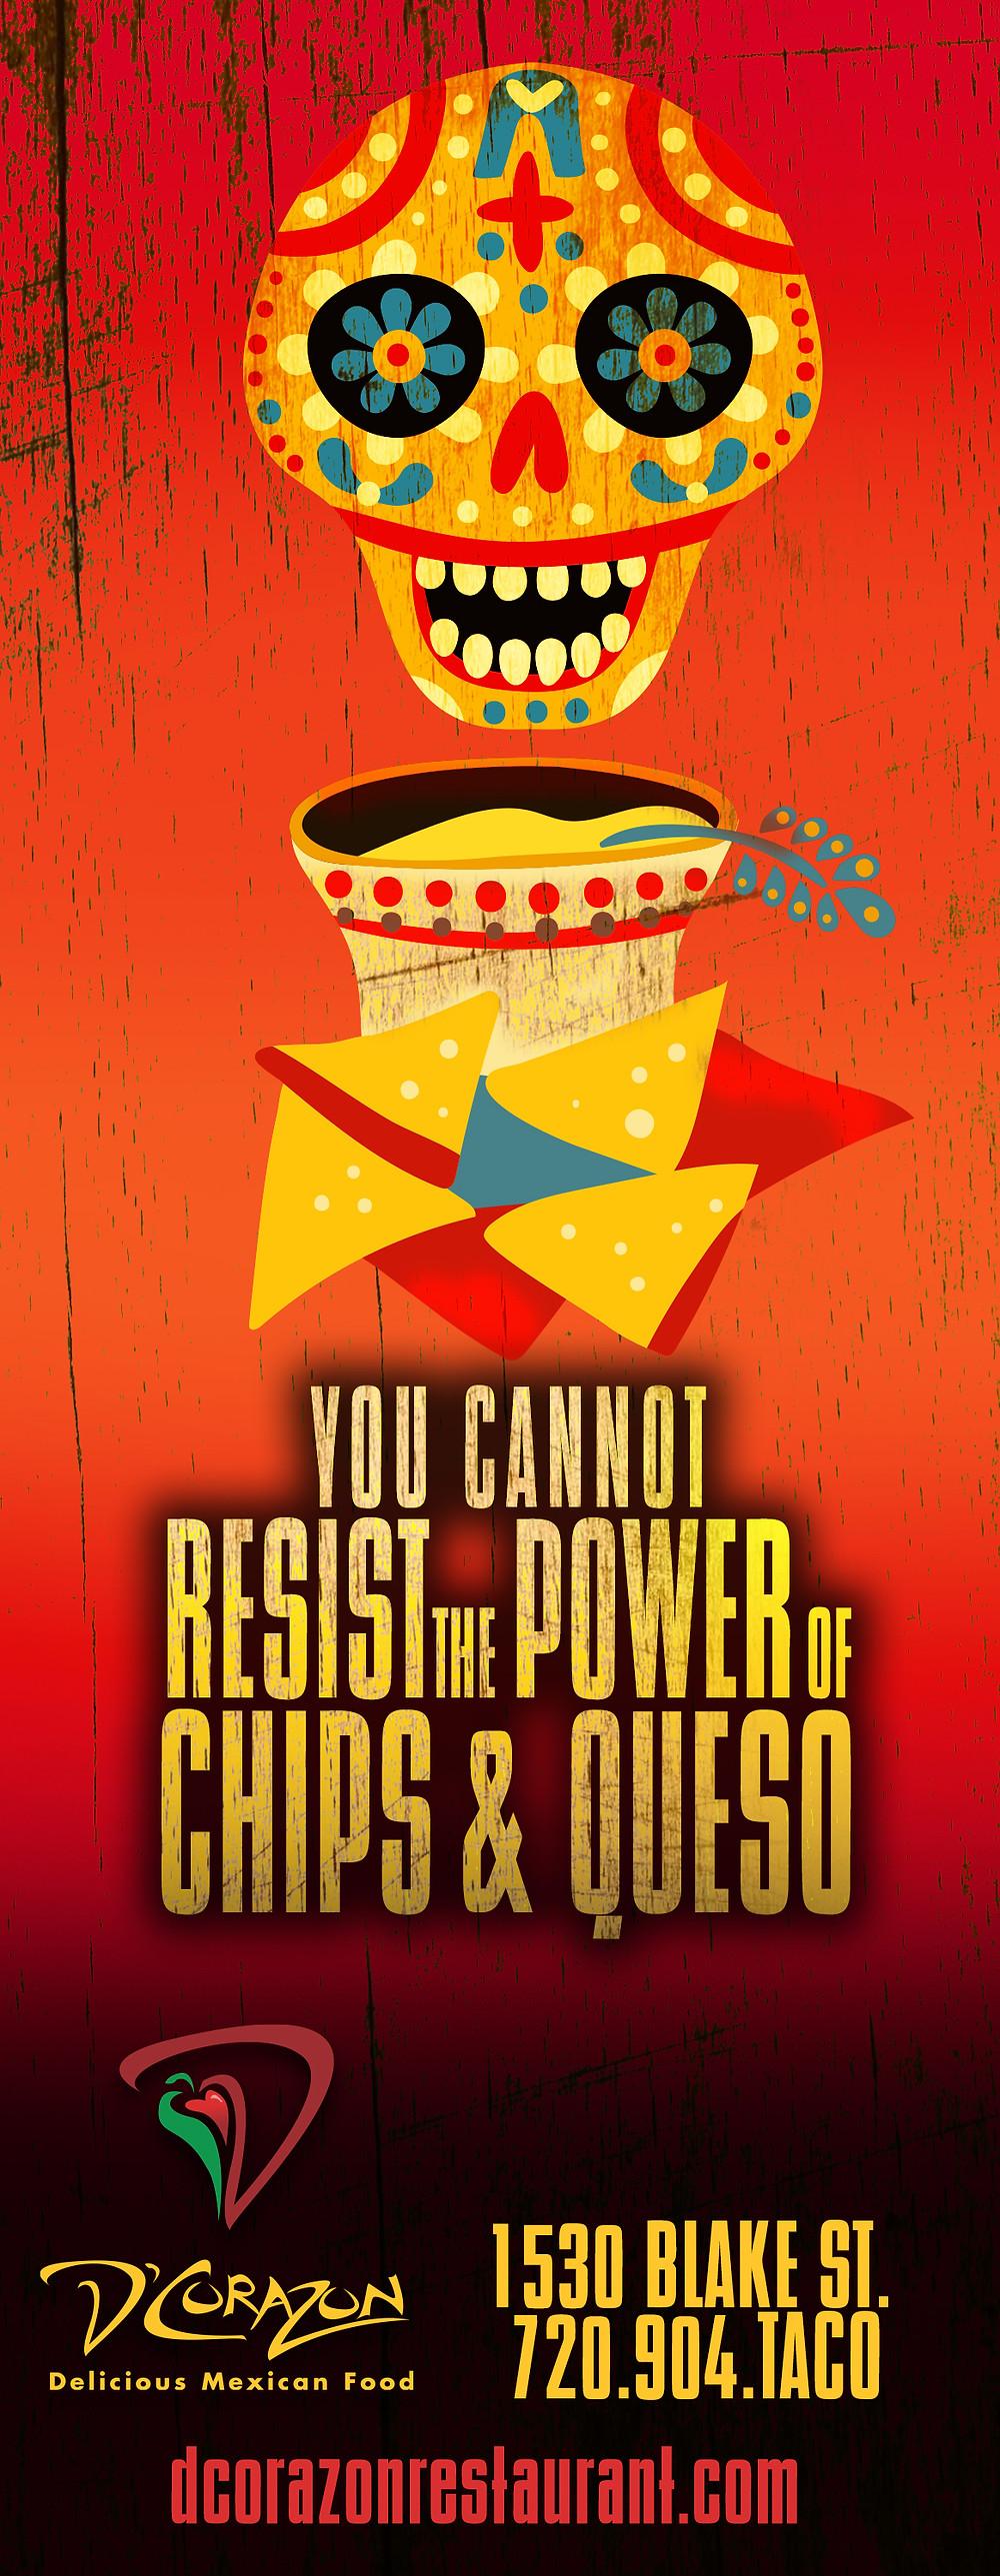 Denver Graphic Designer: Restaurant Ads for Westword - D'Corazon Mexican Restaurant Ad